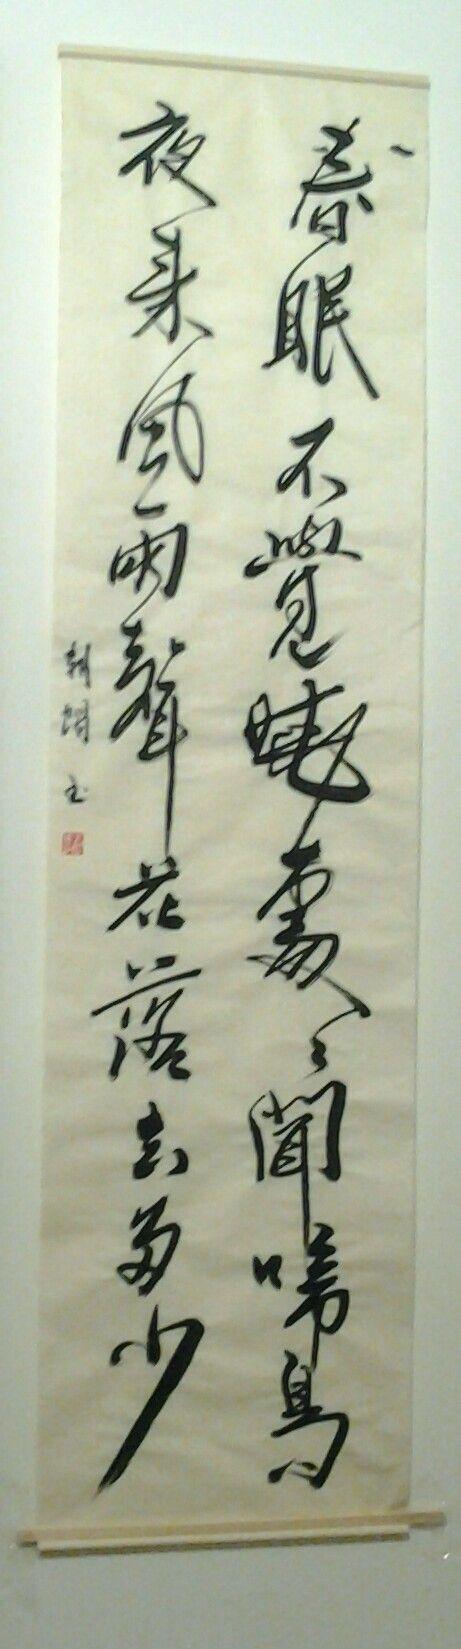 Calligrafia Giapponese di Giuseppe Ponzio - Shodo